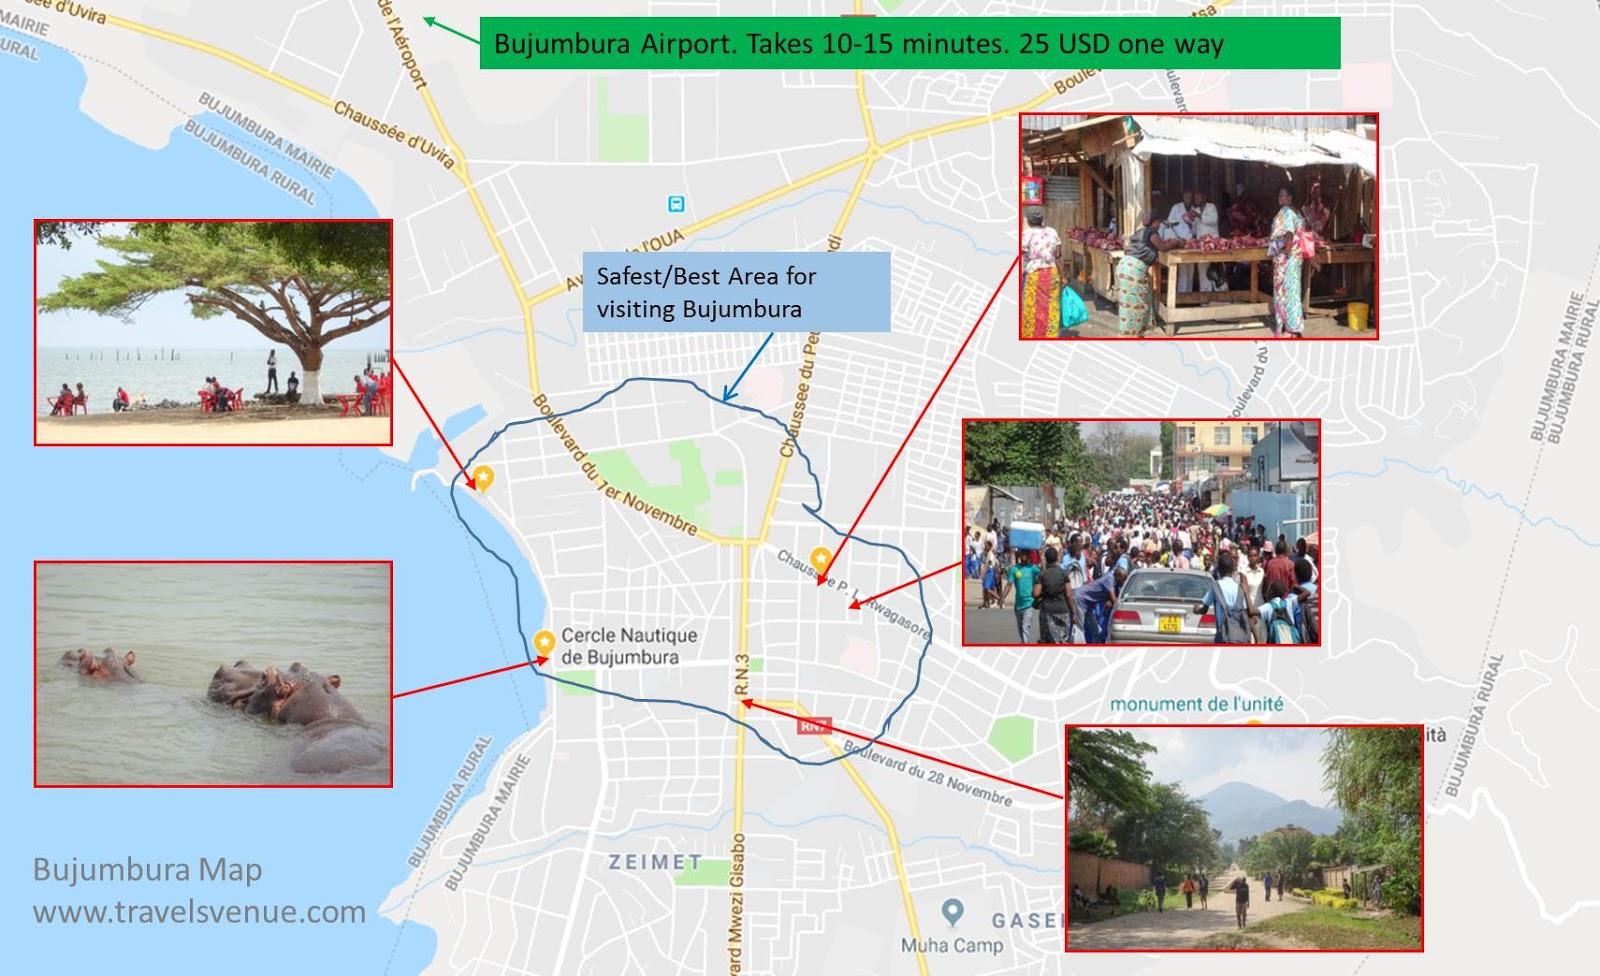 Burundi Unexpected Hippo Lake Svens Travel Venues